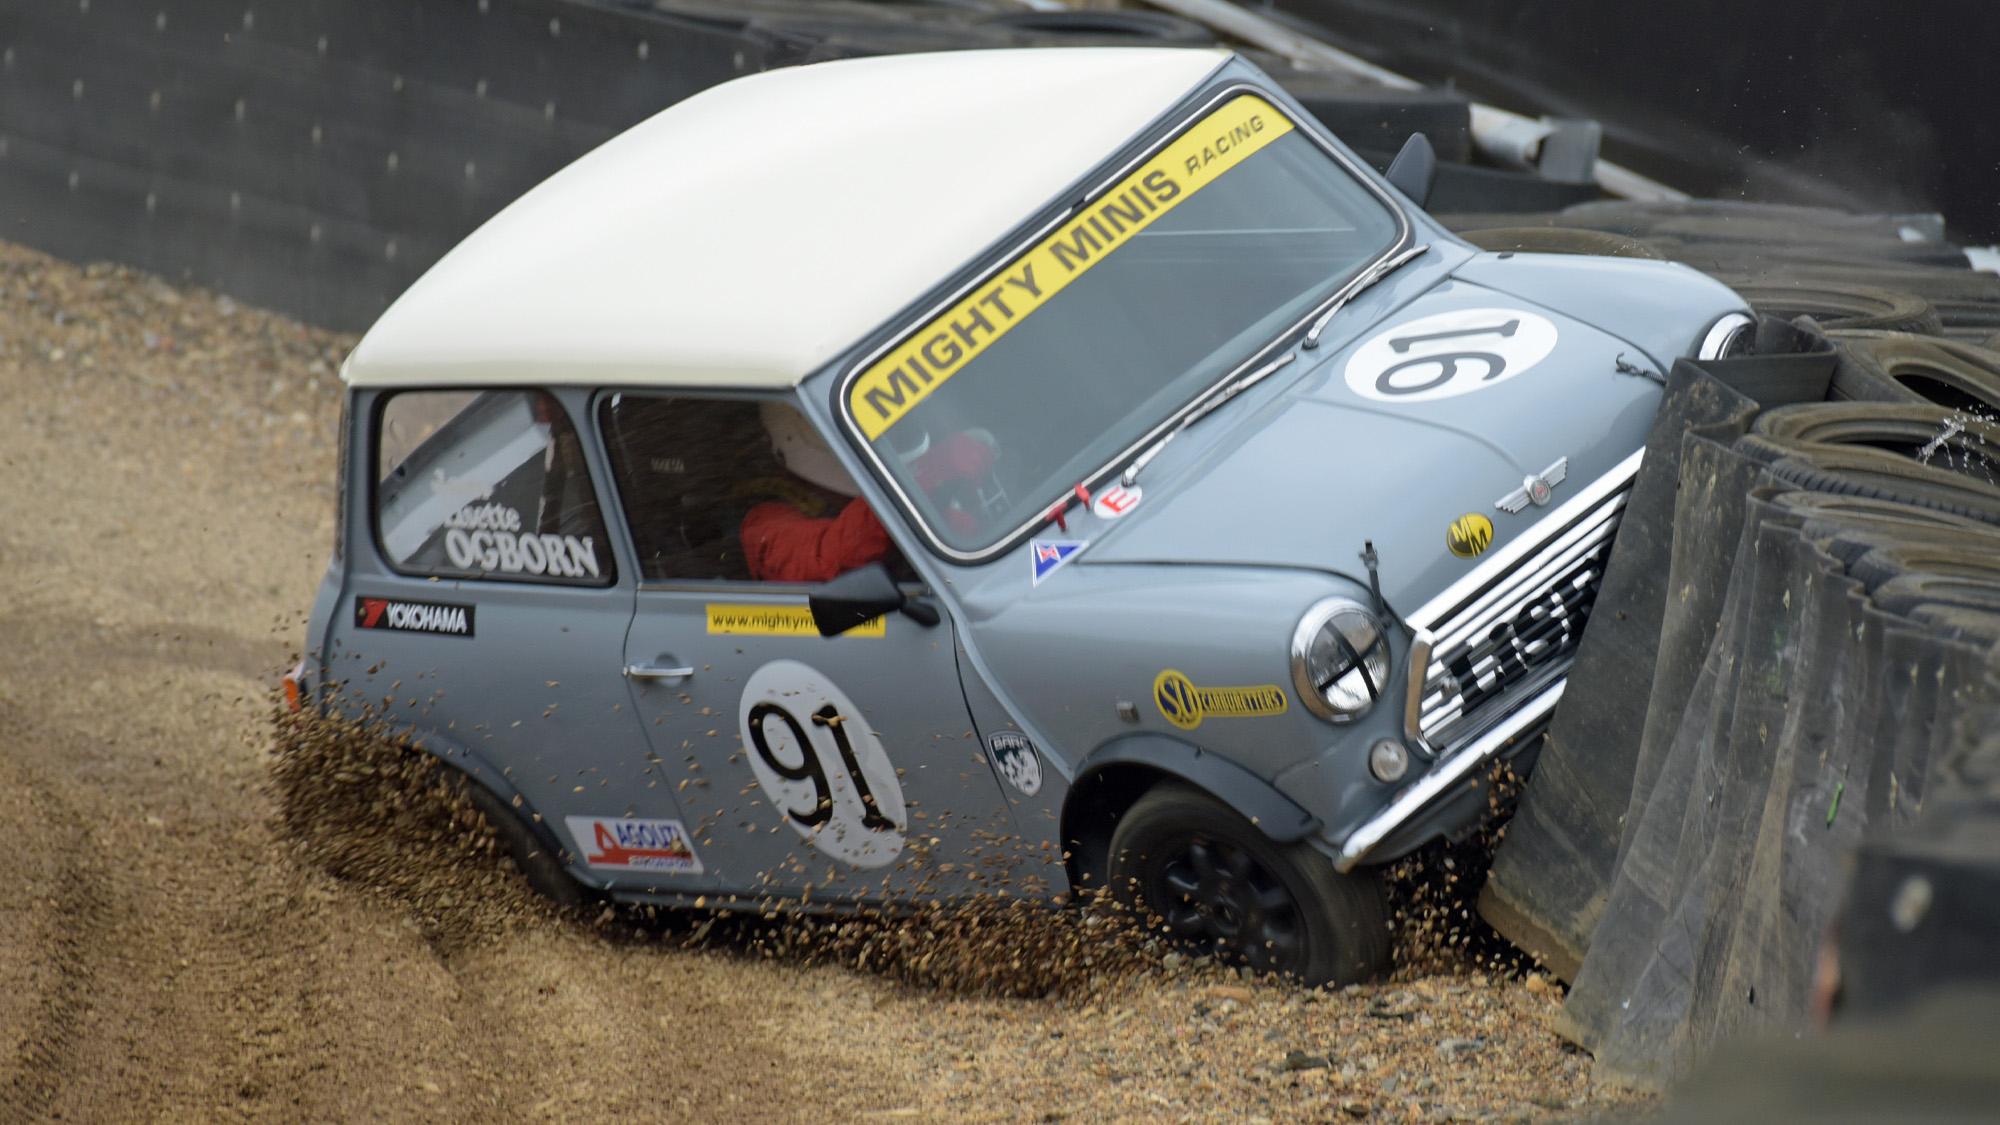 Crashed racing mini